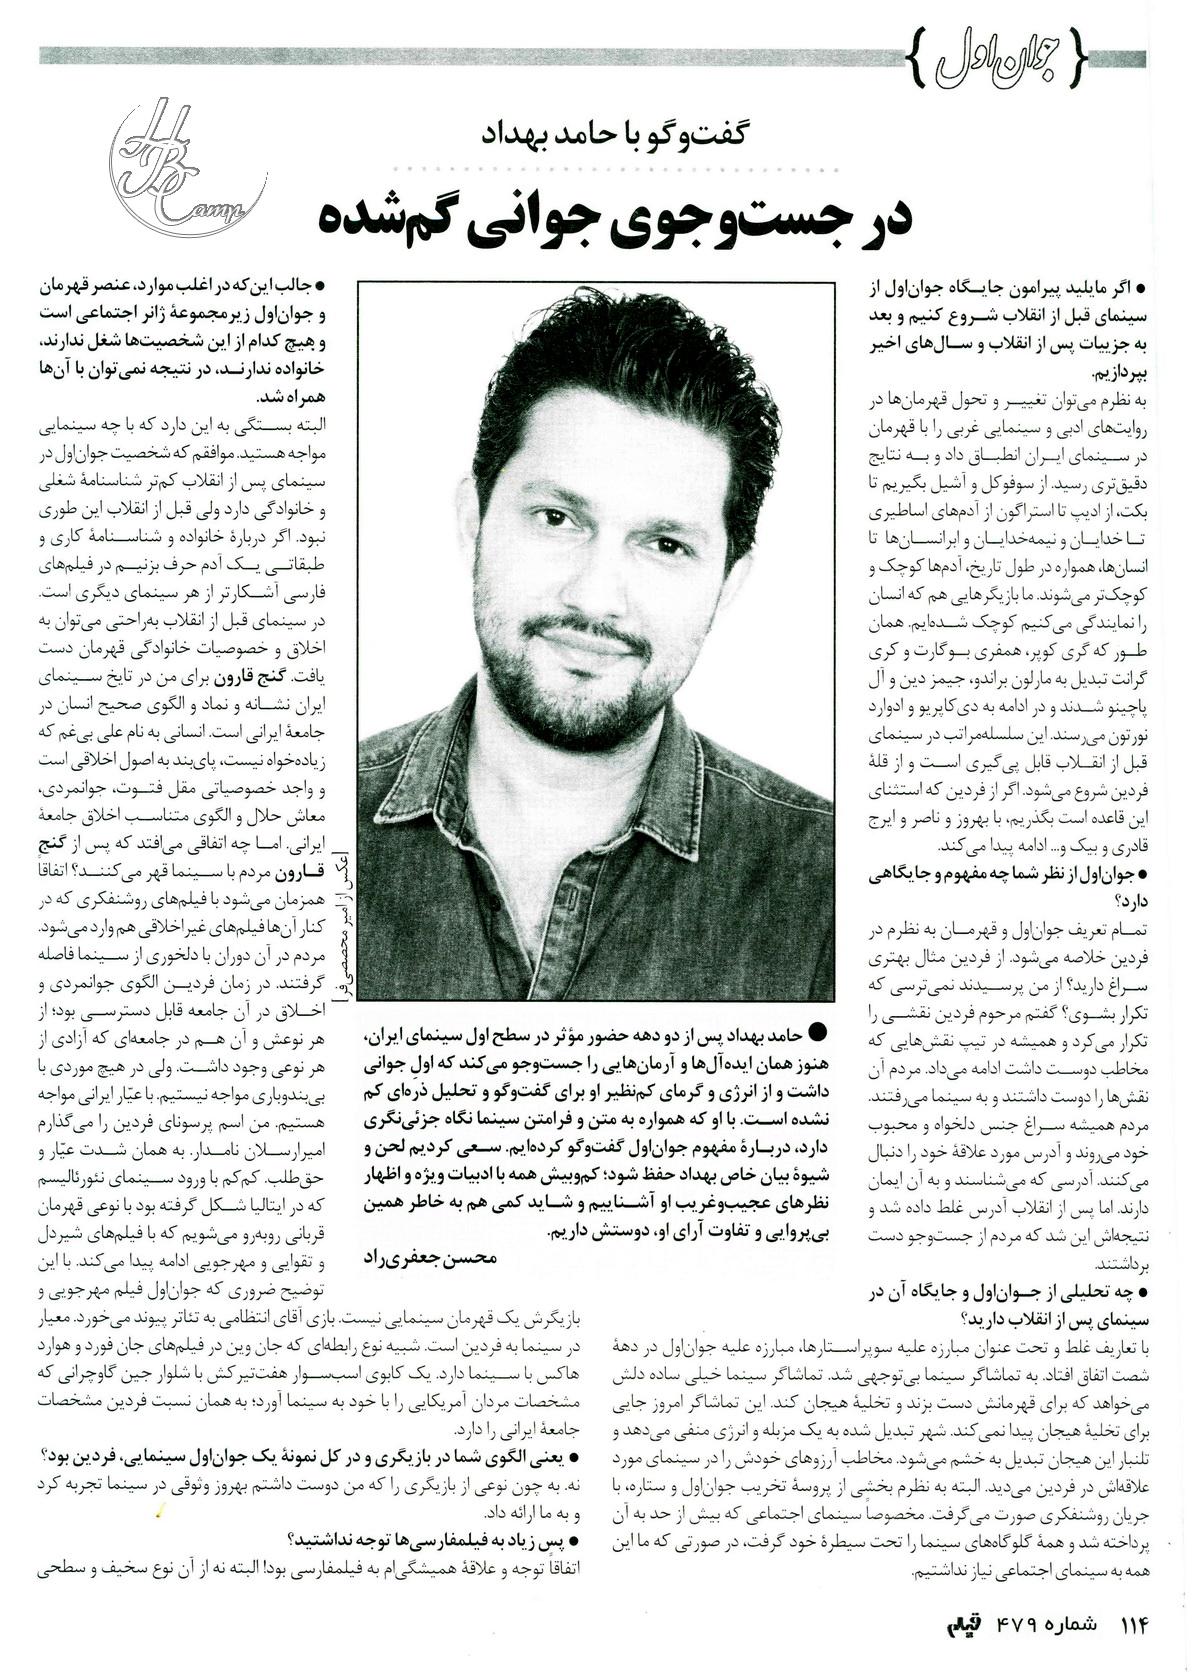 http://yotab.persiangig.com/magazin/film479/001.jpg